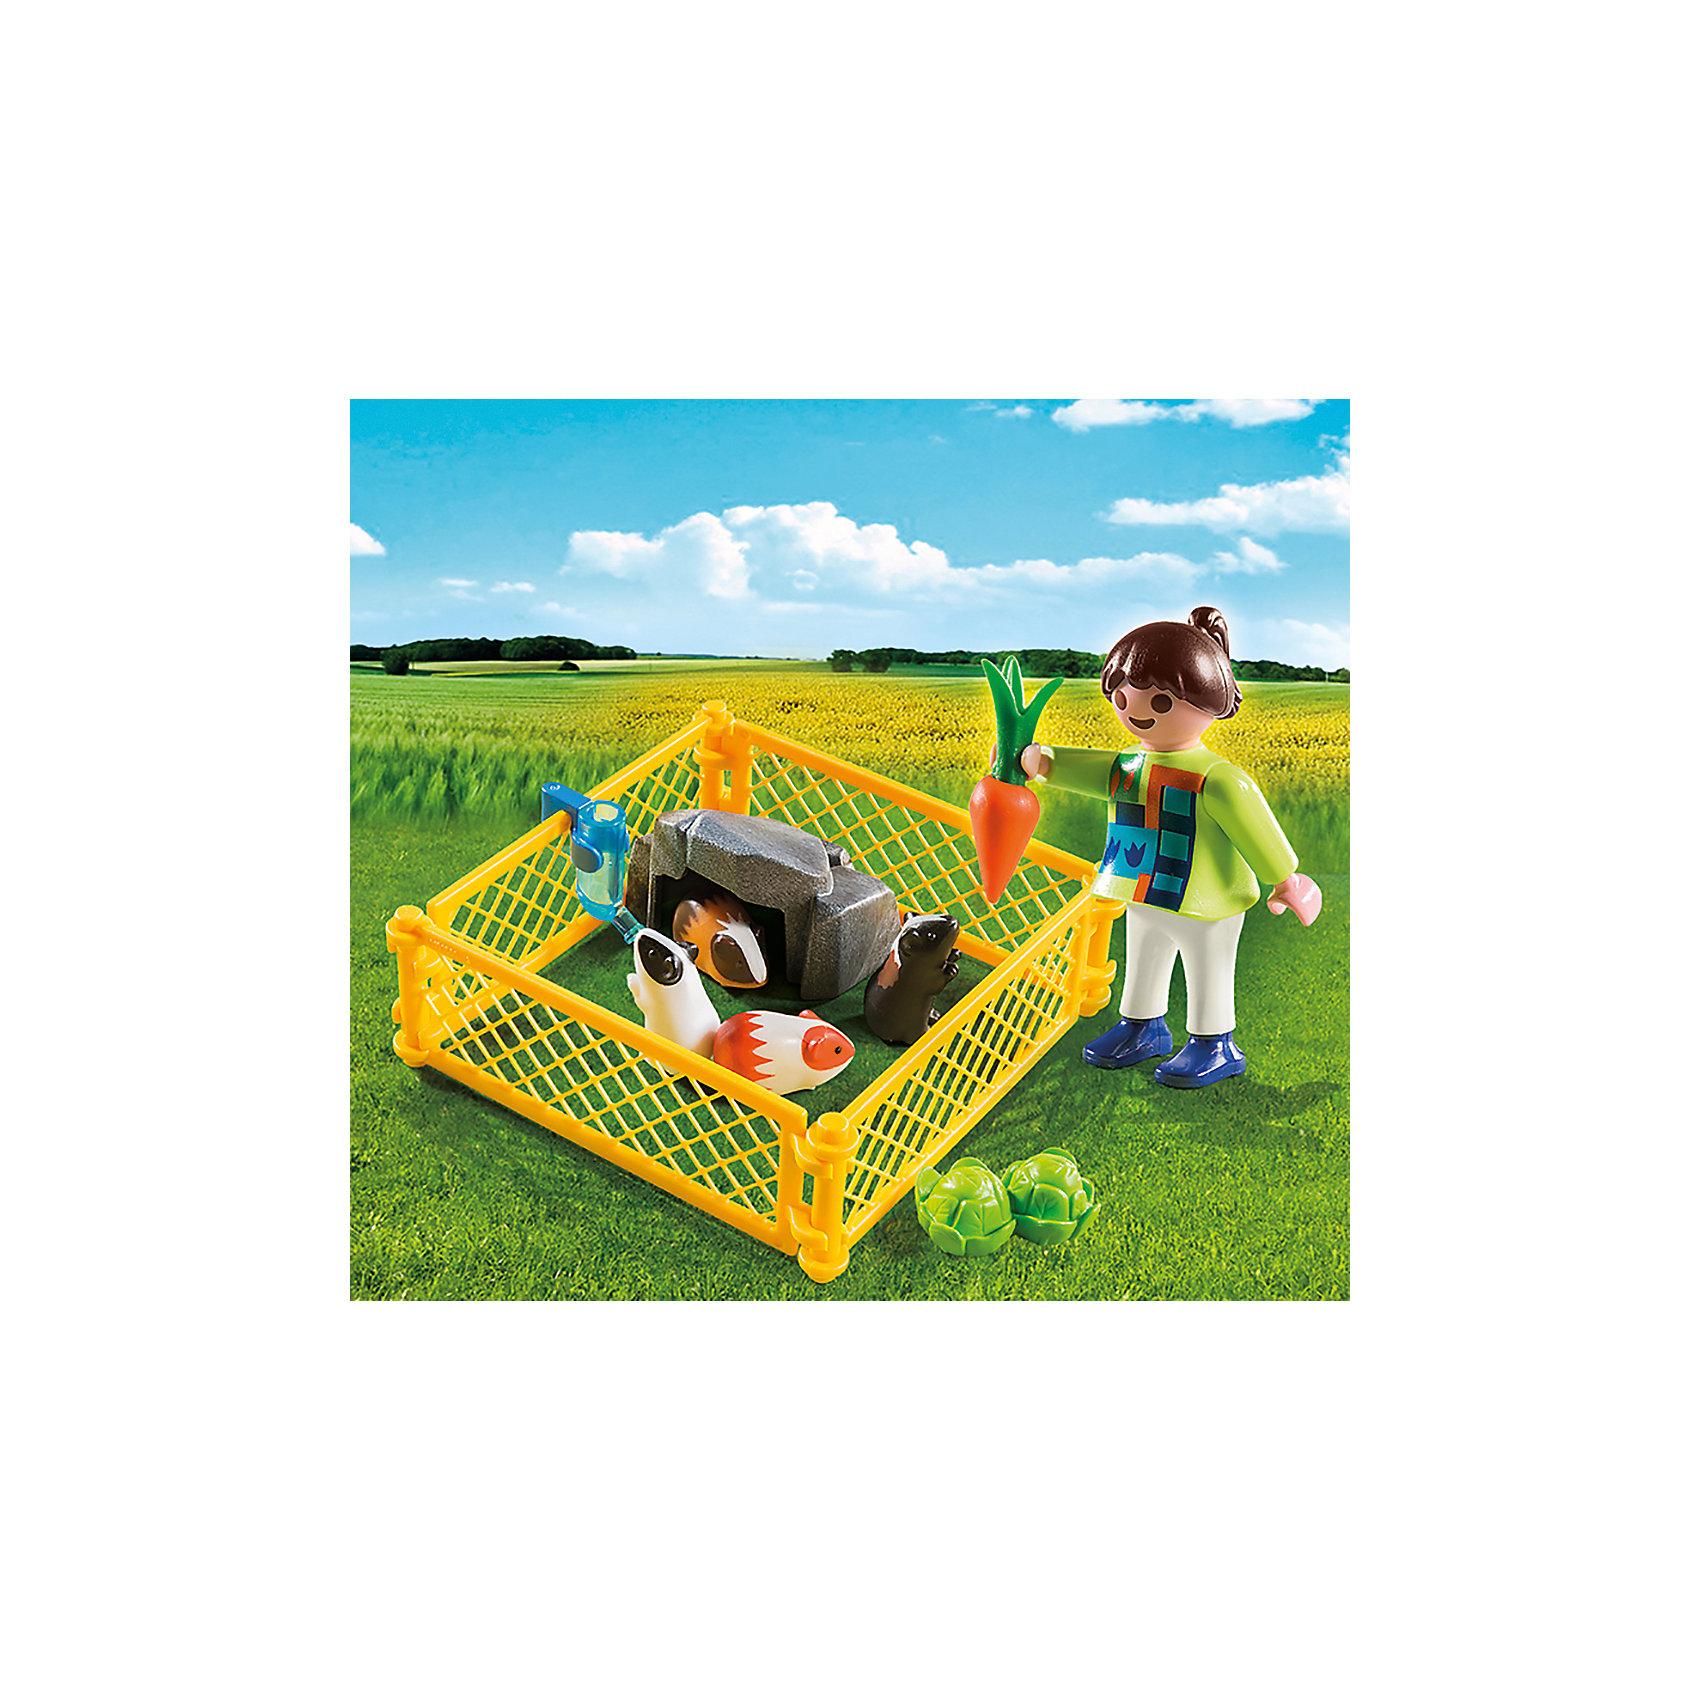 PLAYMOBIL® Экстра-набор: Девочка с морскими свинками, PLAYMOBIL playmobil® экстра набор фея с оленем playmobil